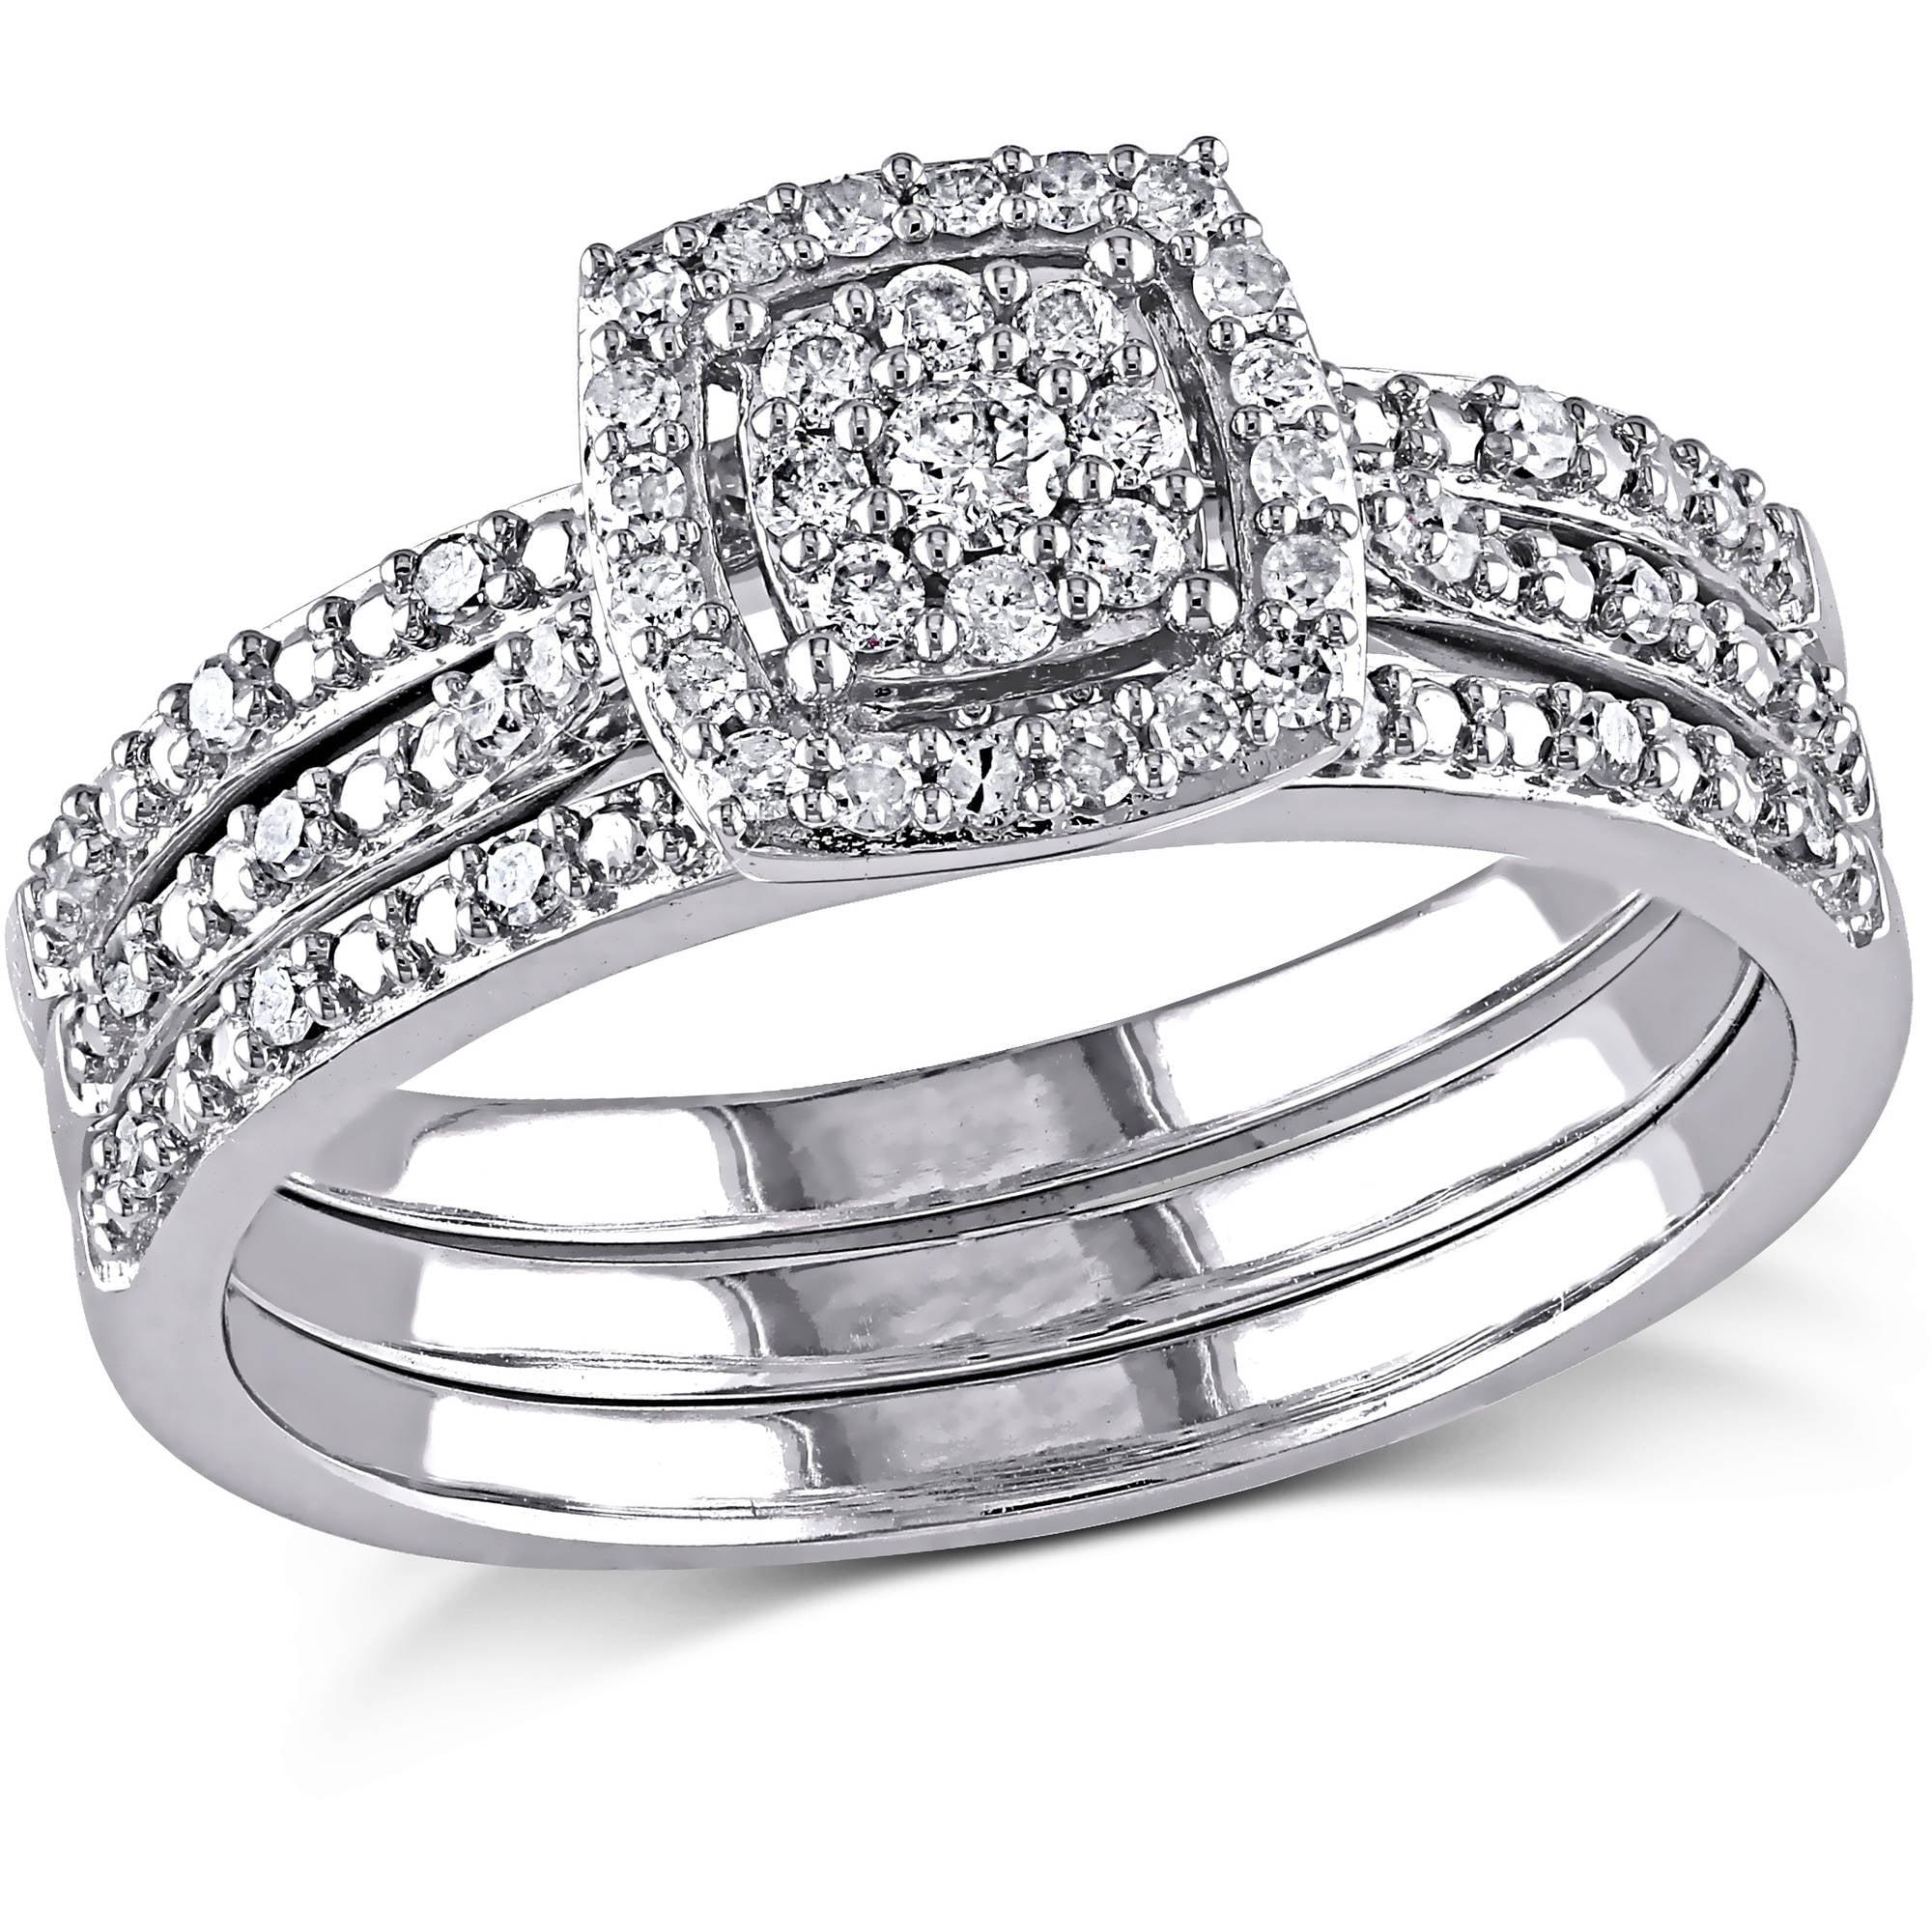 Miabella 1 3 Carat Diamond 10kt White Gold Halo Bridal Set by Delmar Manufacturing LLC